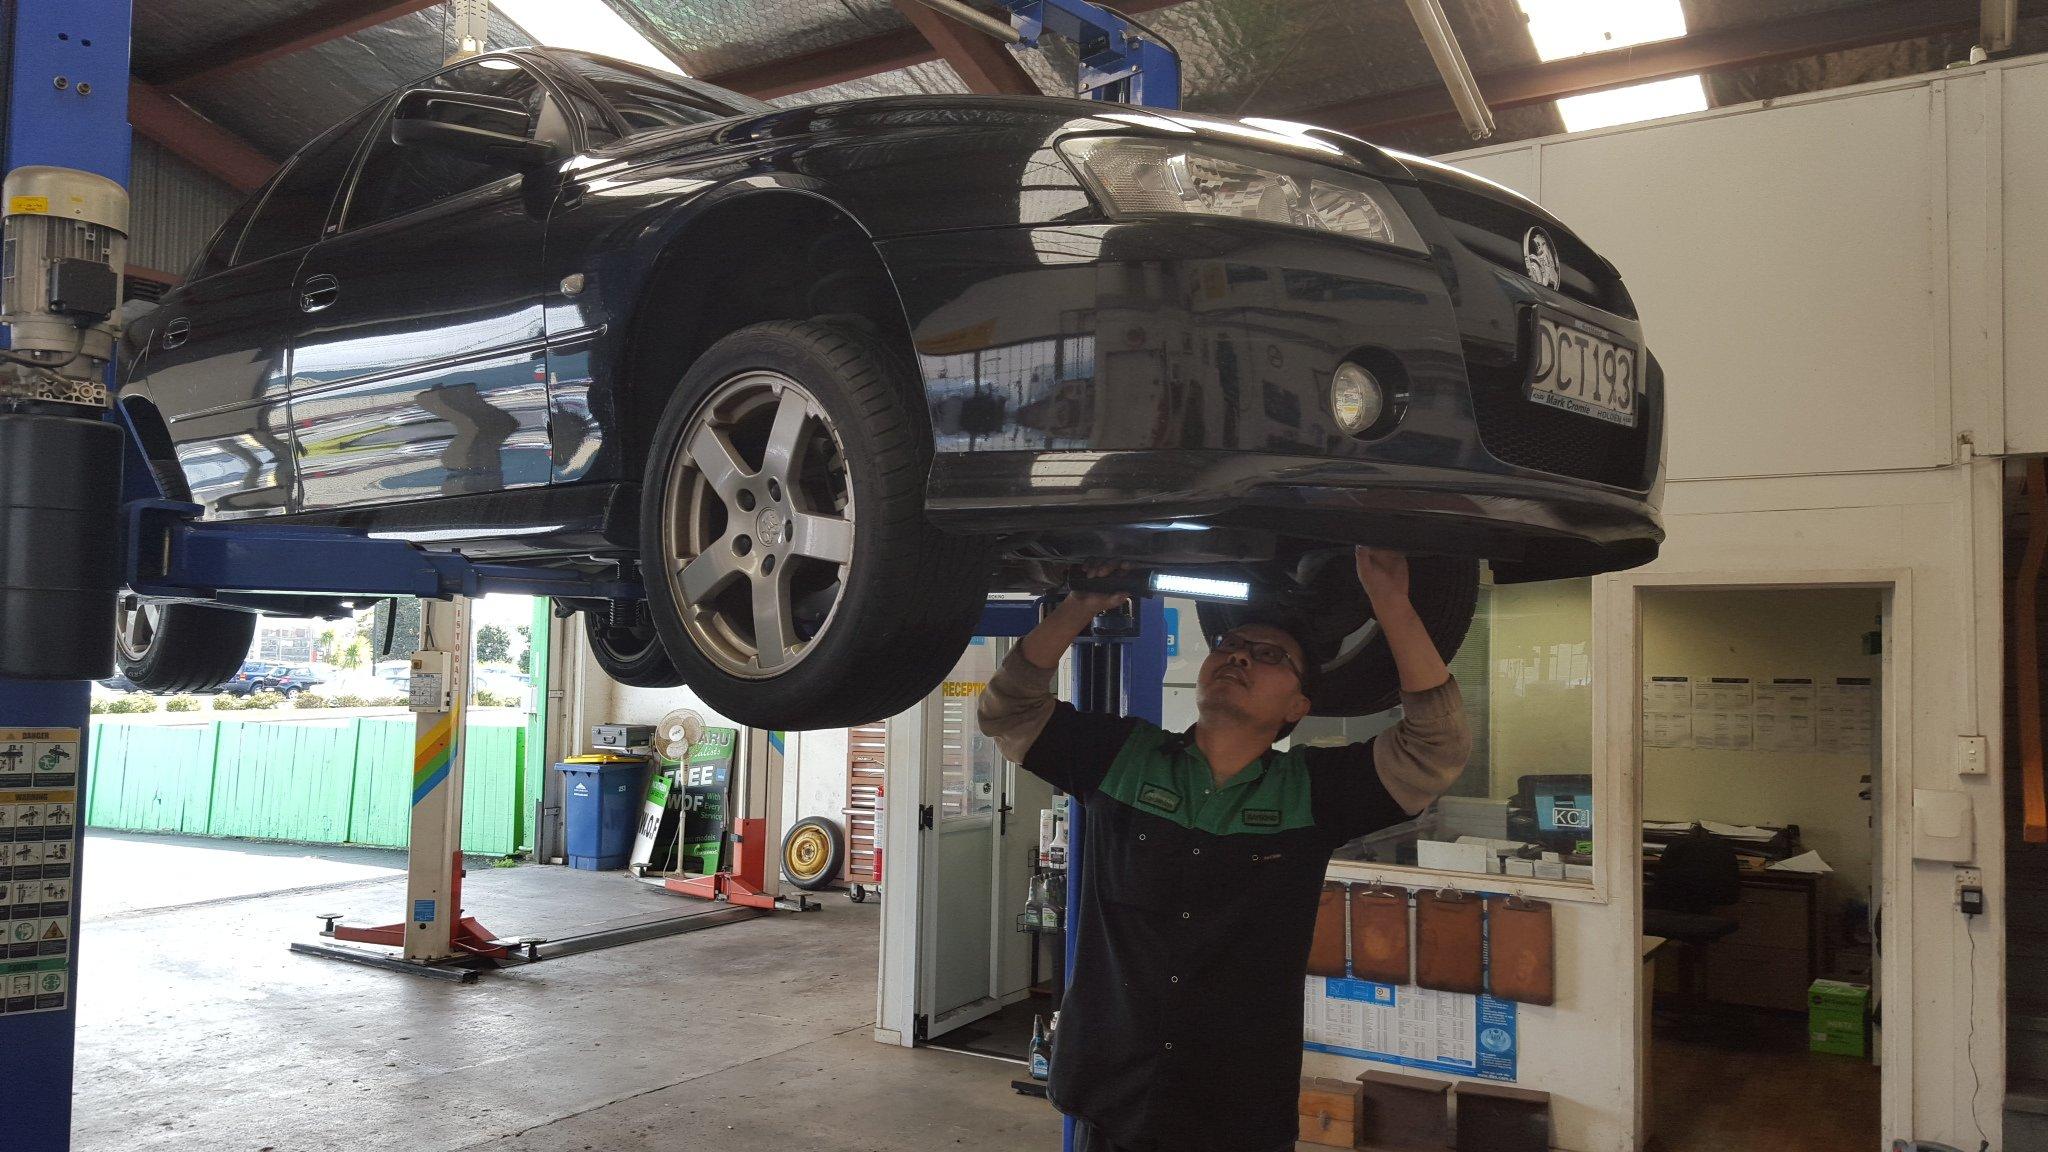 Car mechanic holding up keys after completed service